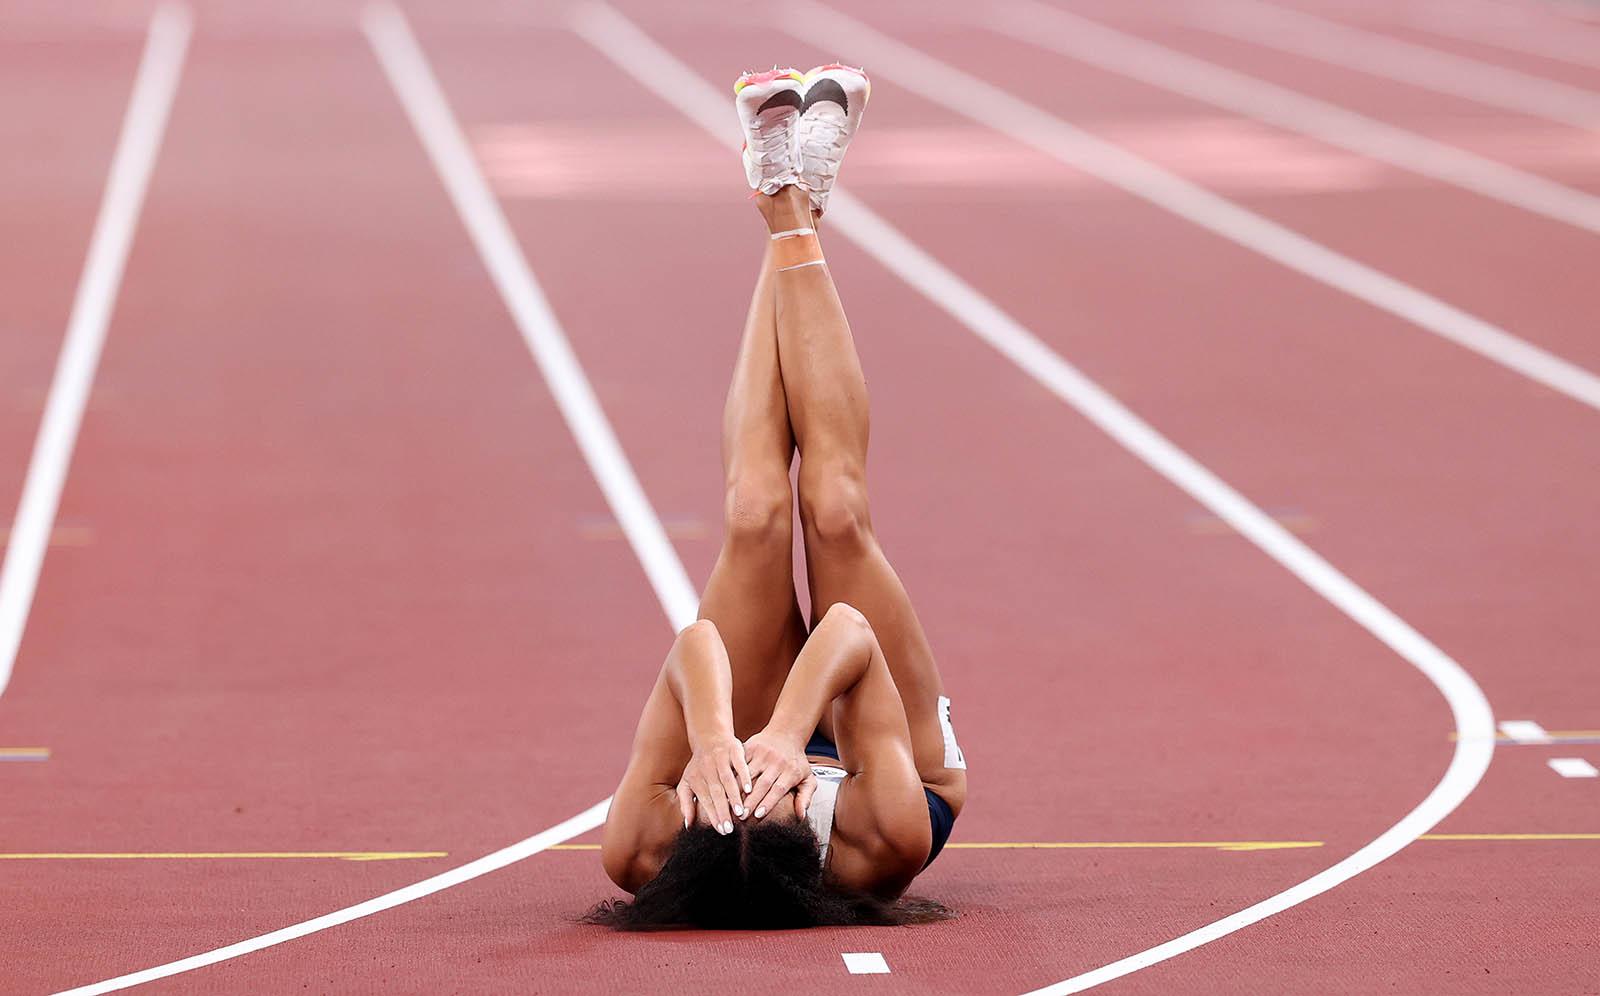 Katarina Johnson-Thompson of Great Britain sustains an injury in the women's heptathlon 200m event on August 4.